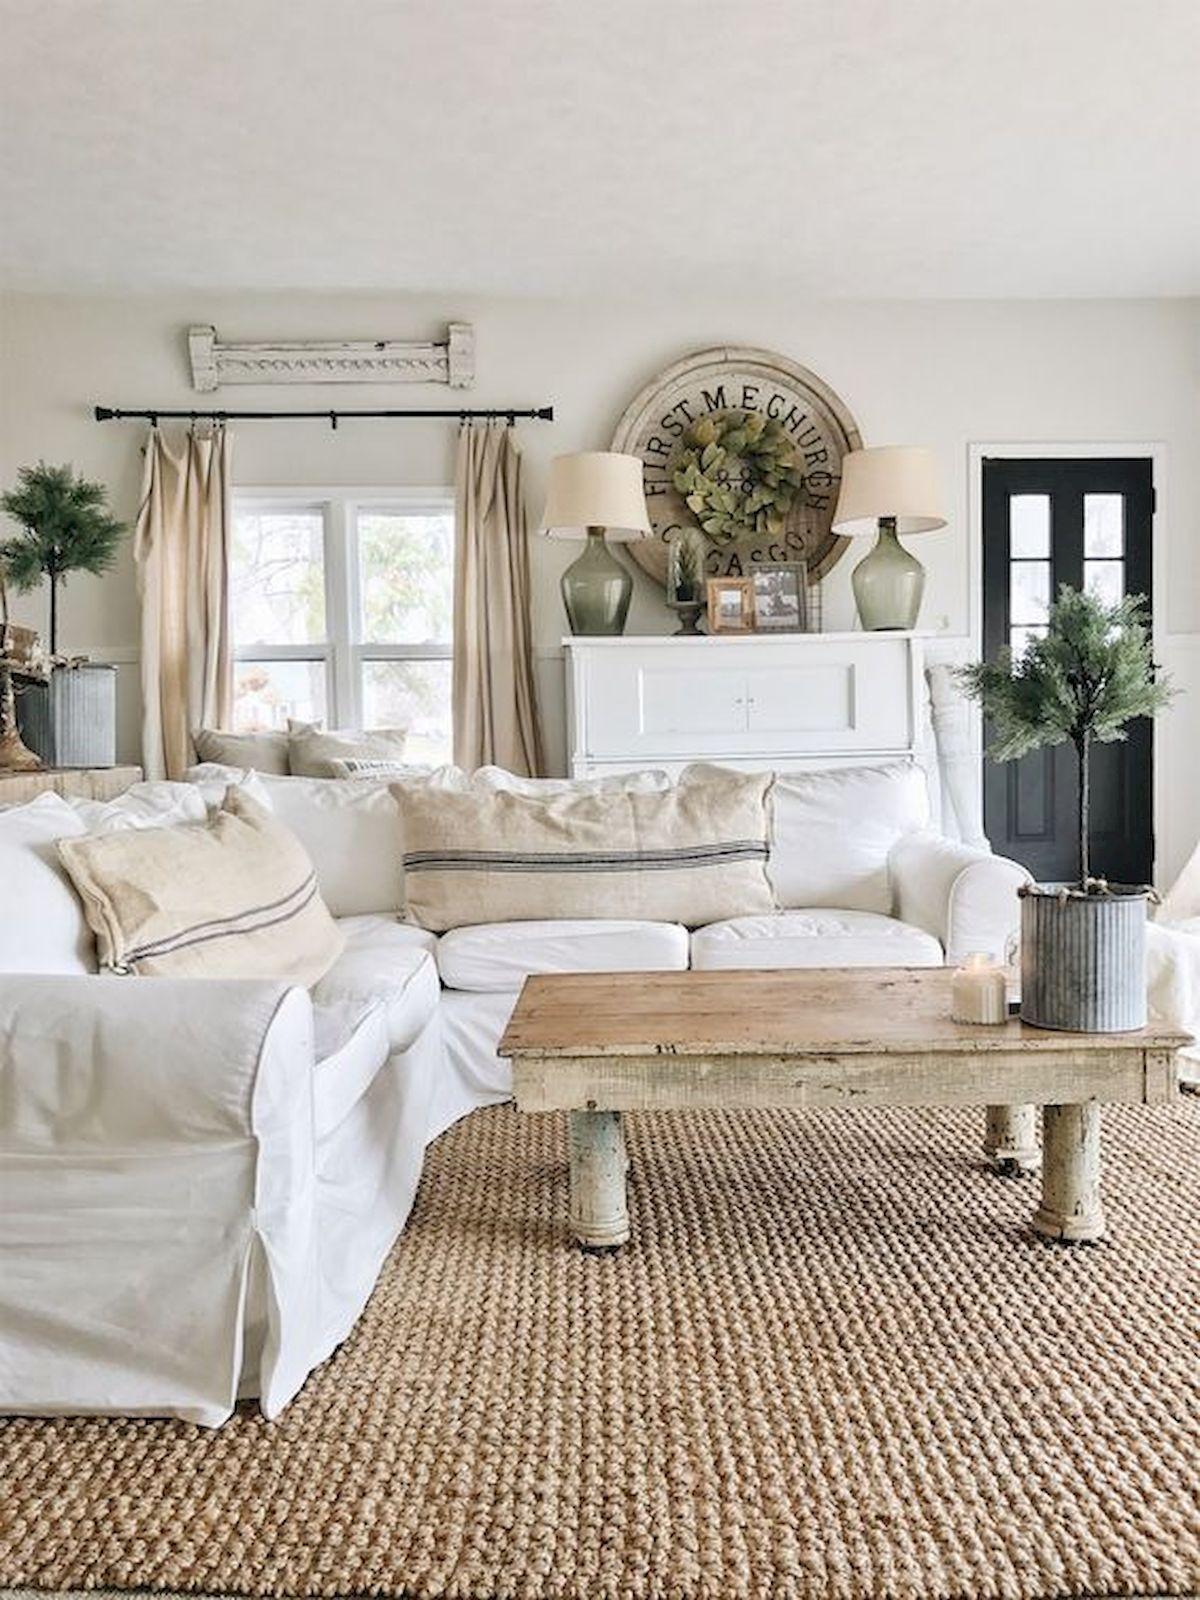 Adorable 30 Stunning Farmhouse Living Room Decor Ideas H